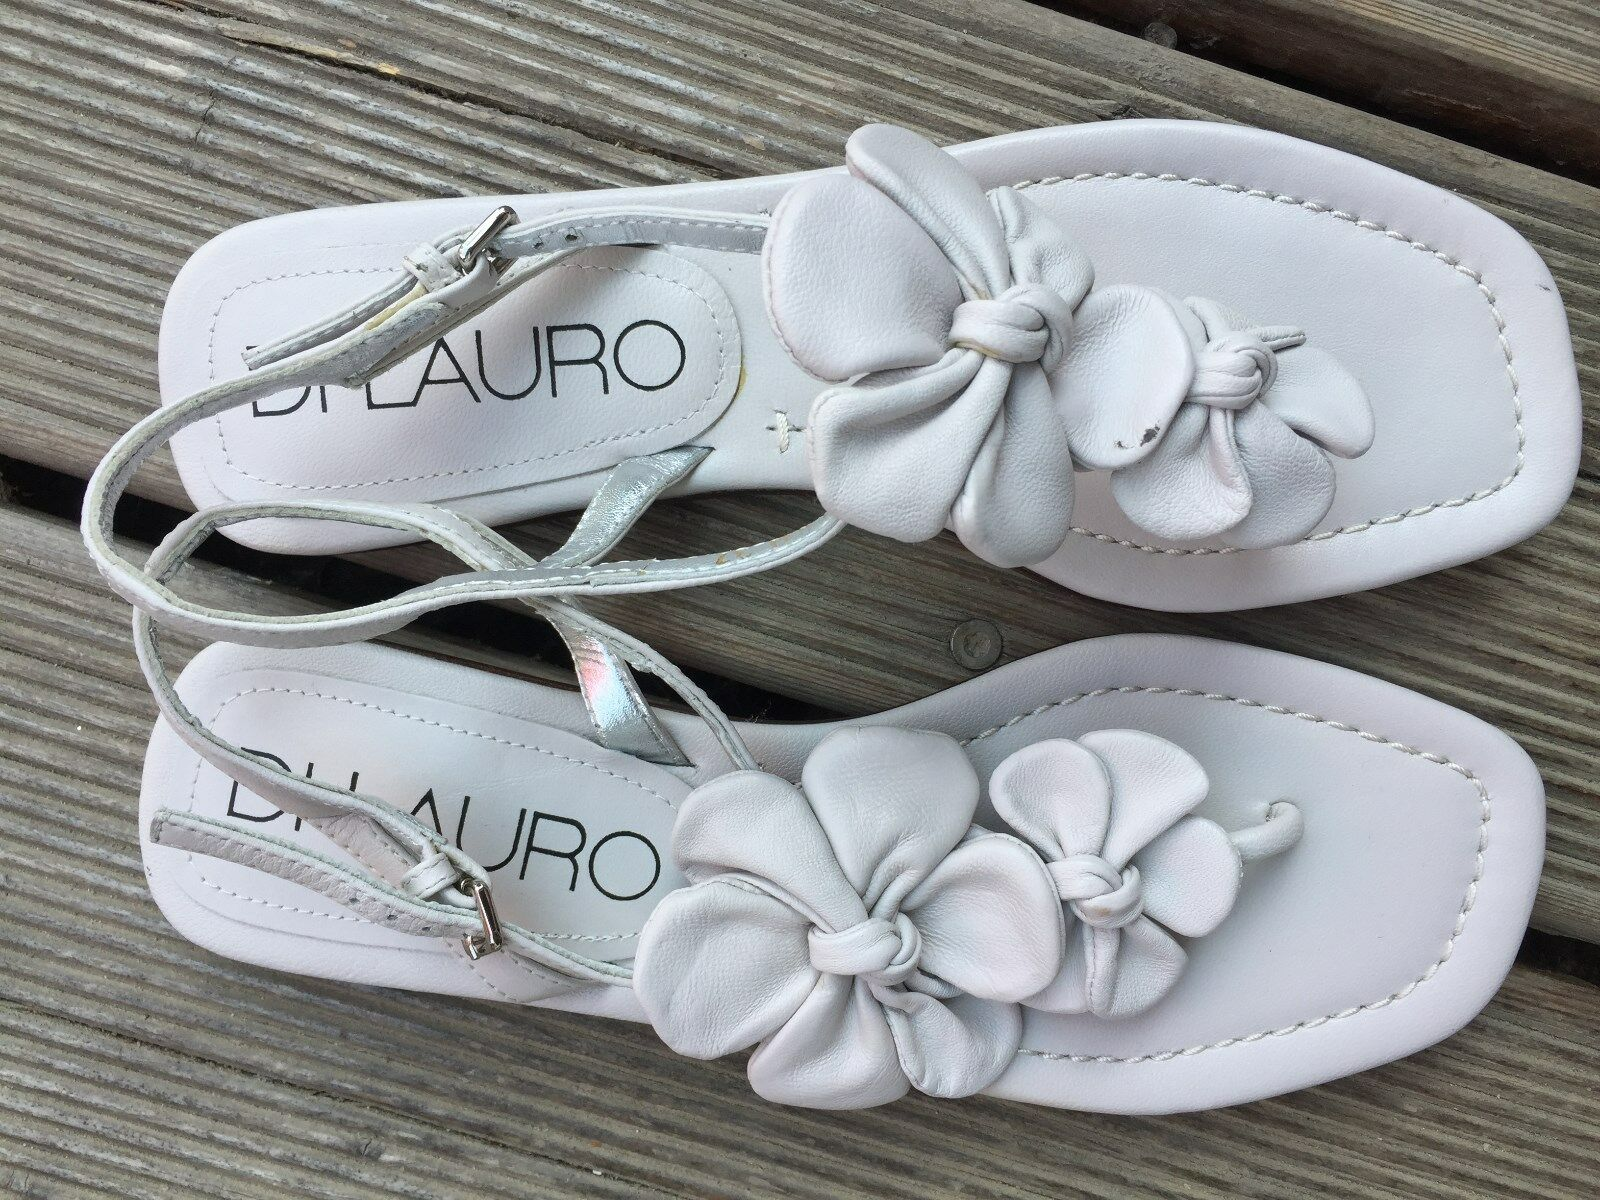 Di Lauro Sandalen Zehentrenner Gr. 37 sehr Schuhe hübsche Schuhe sehr 0e47c4